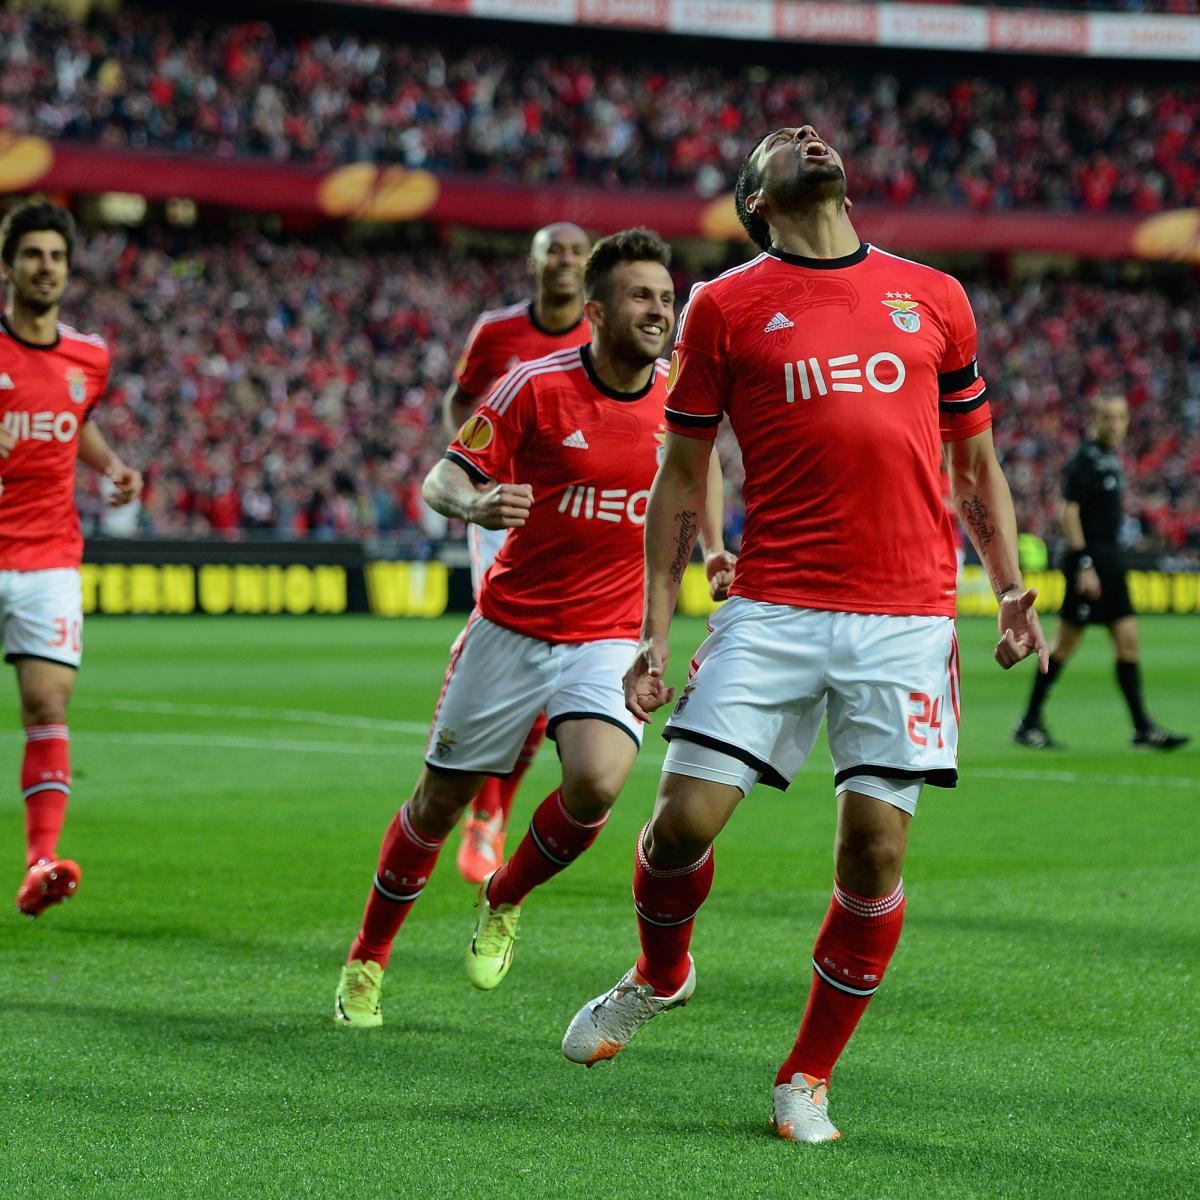 Live Streaming Soccer News Liverpool Vs Benfica Live: Sevilla Vs Benfica: Europa League Final 2014 Start Time